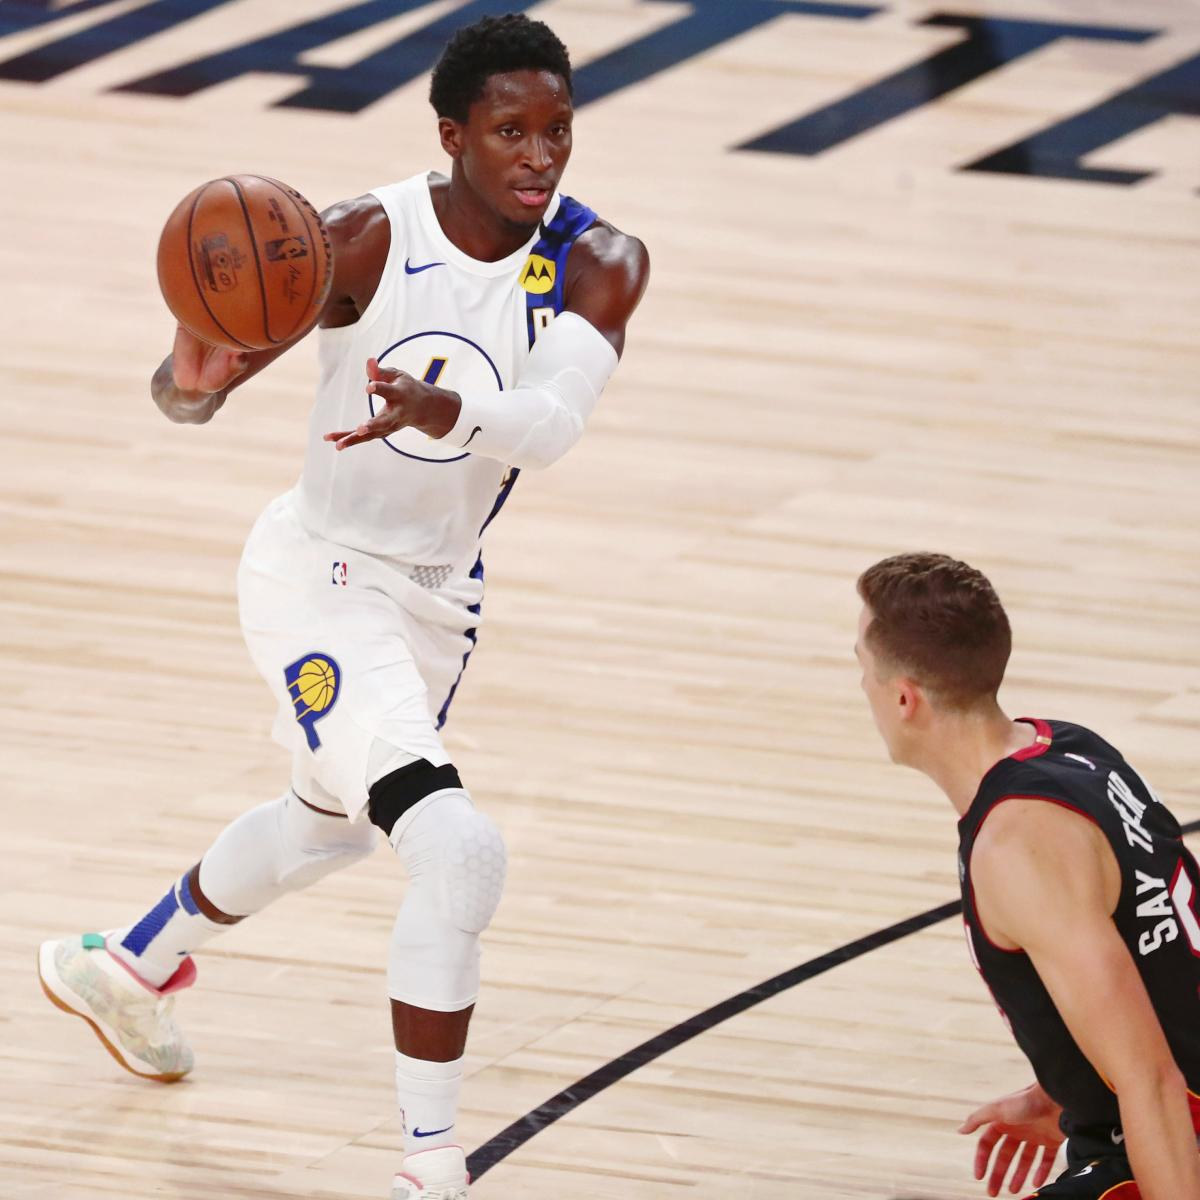 NBA Rumors: Latest Buzz on Victor Oladipo, Lou Williams Trades, More